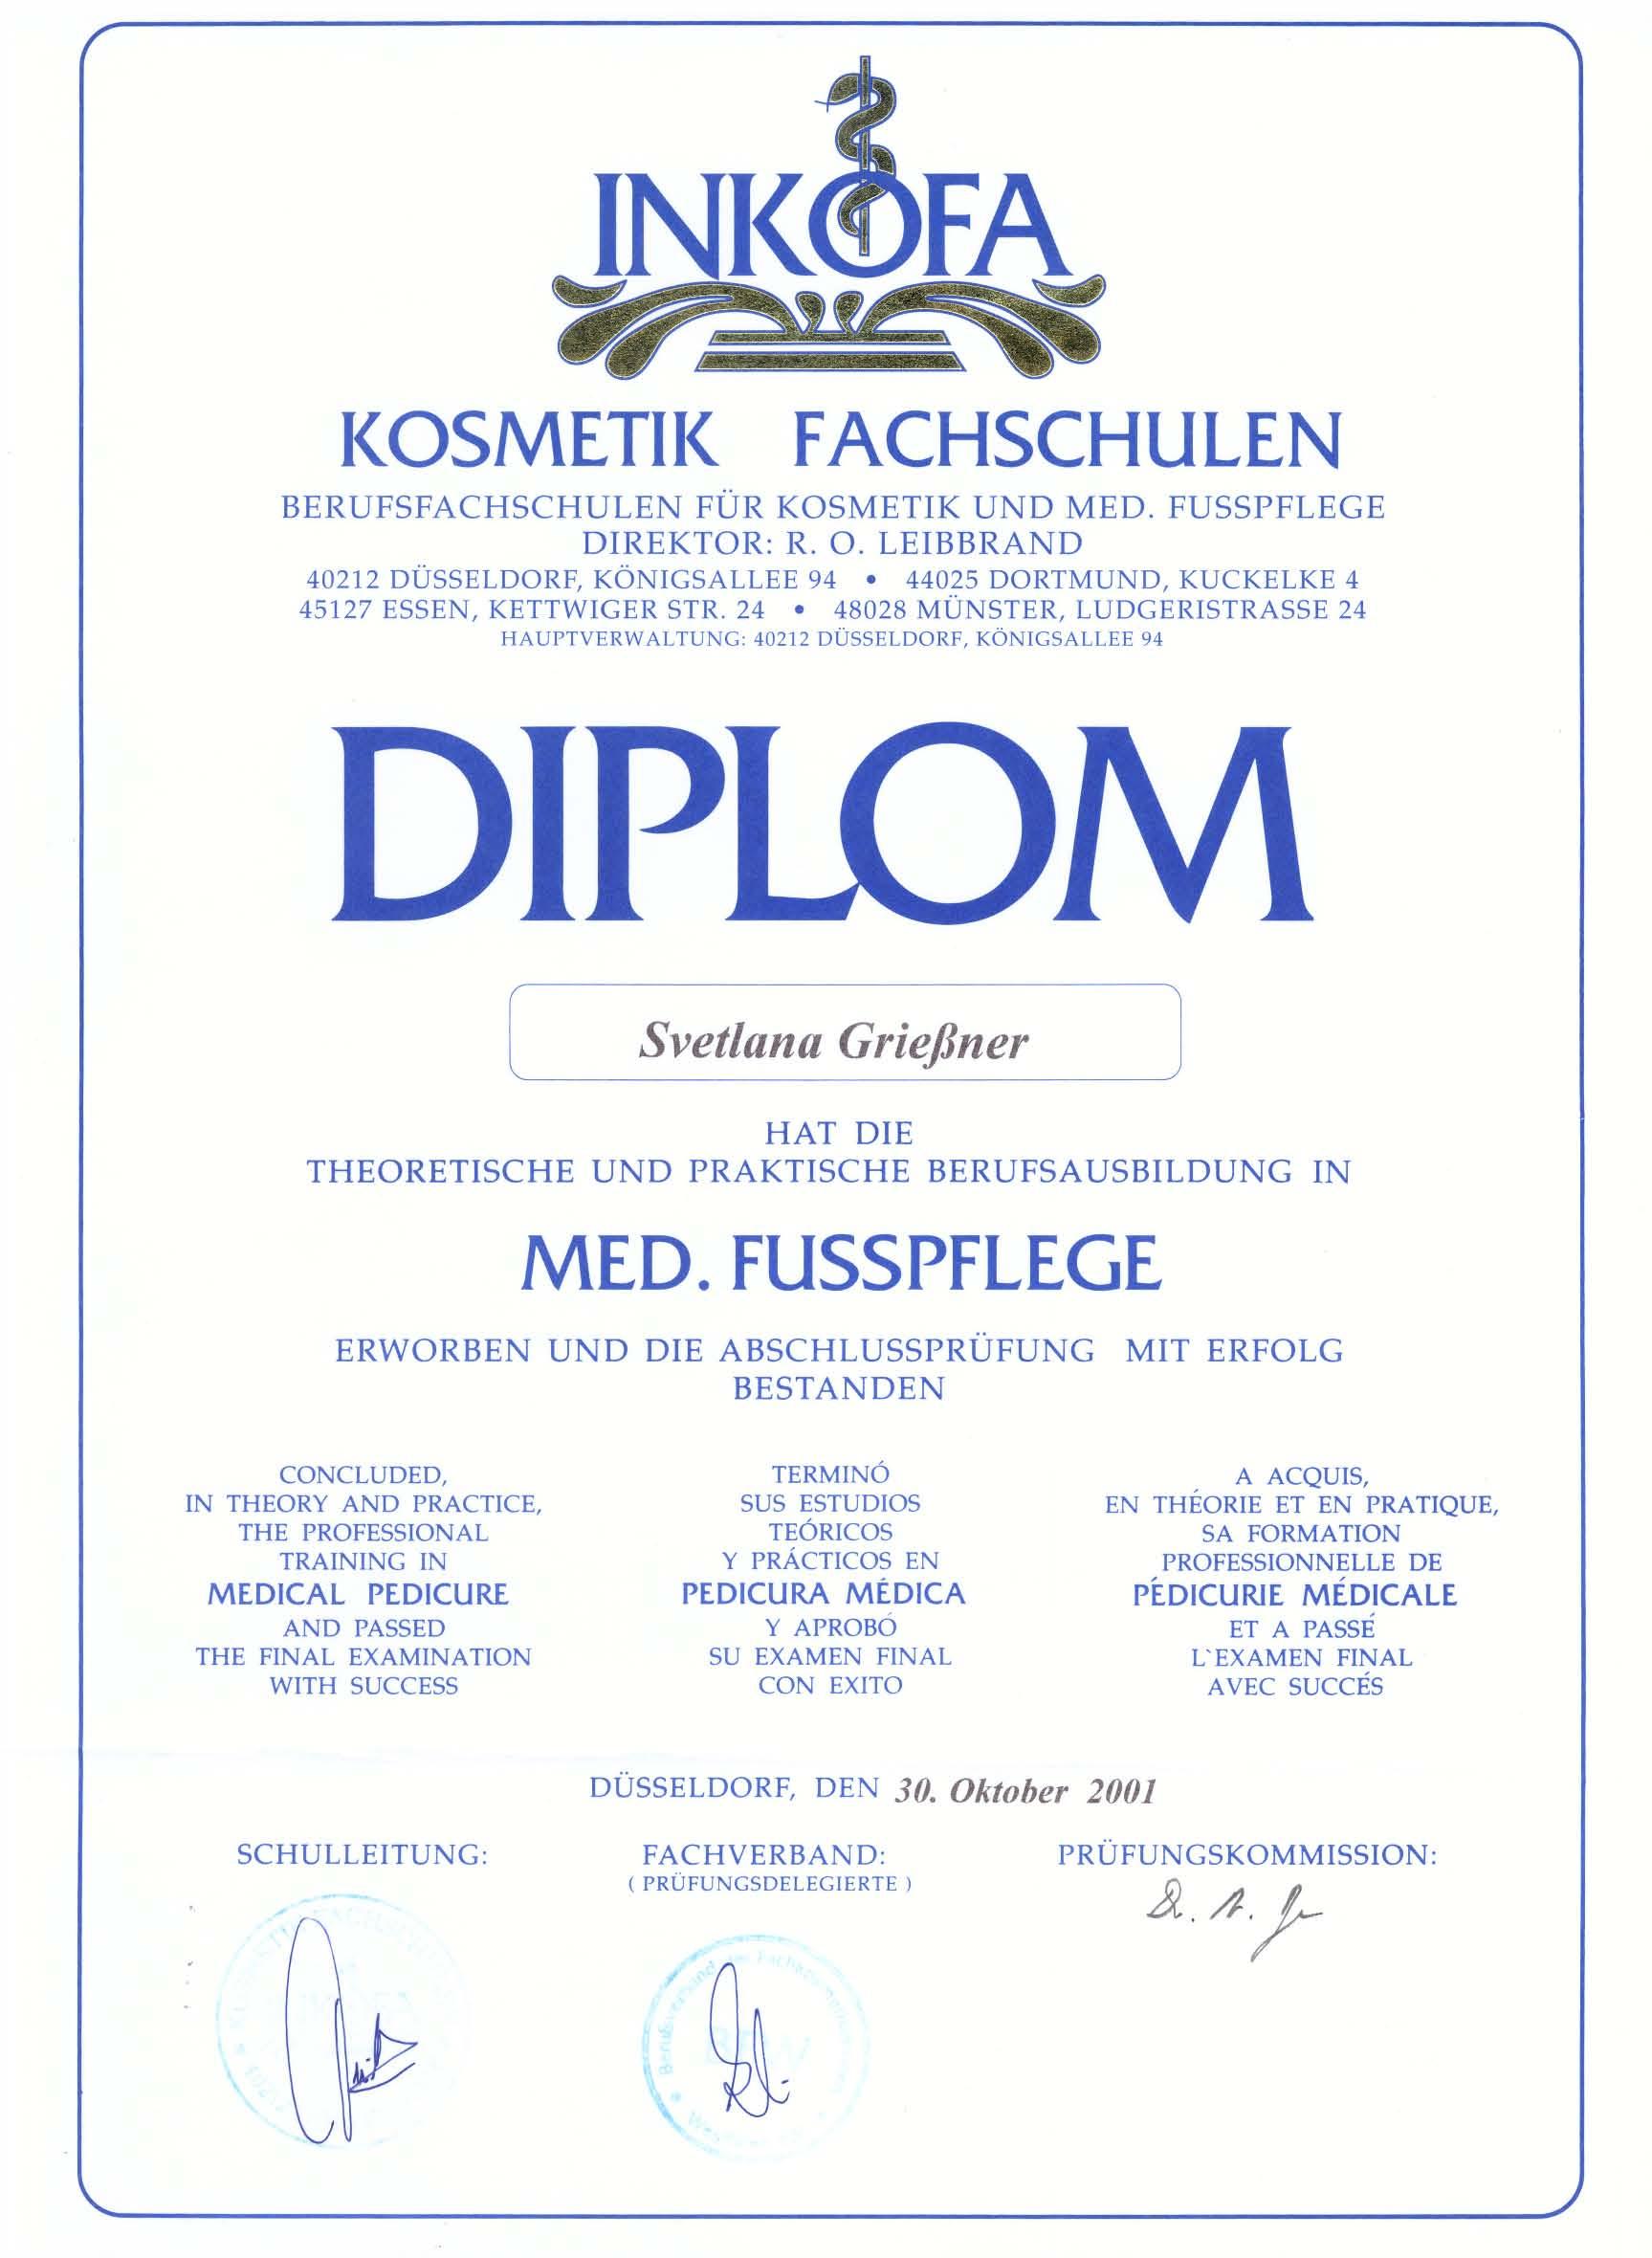 INKOFA Diplom